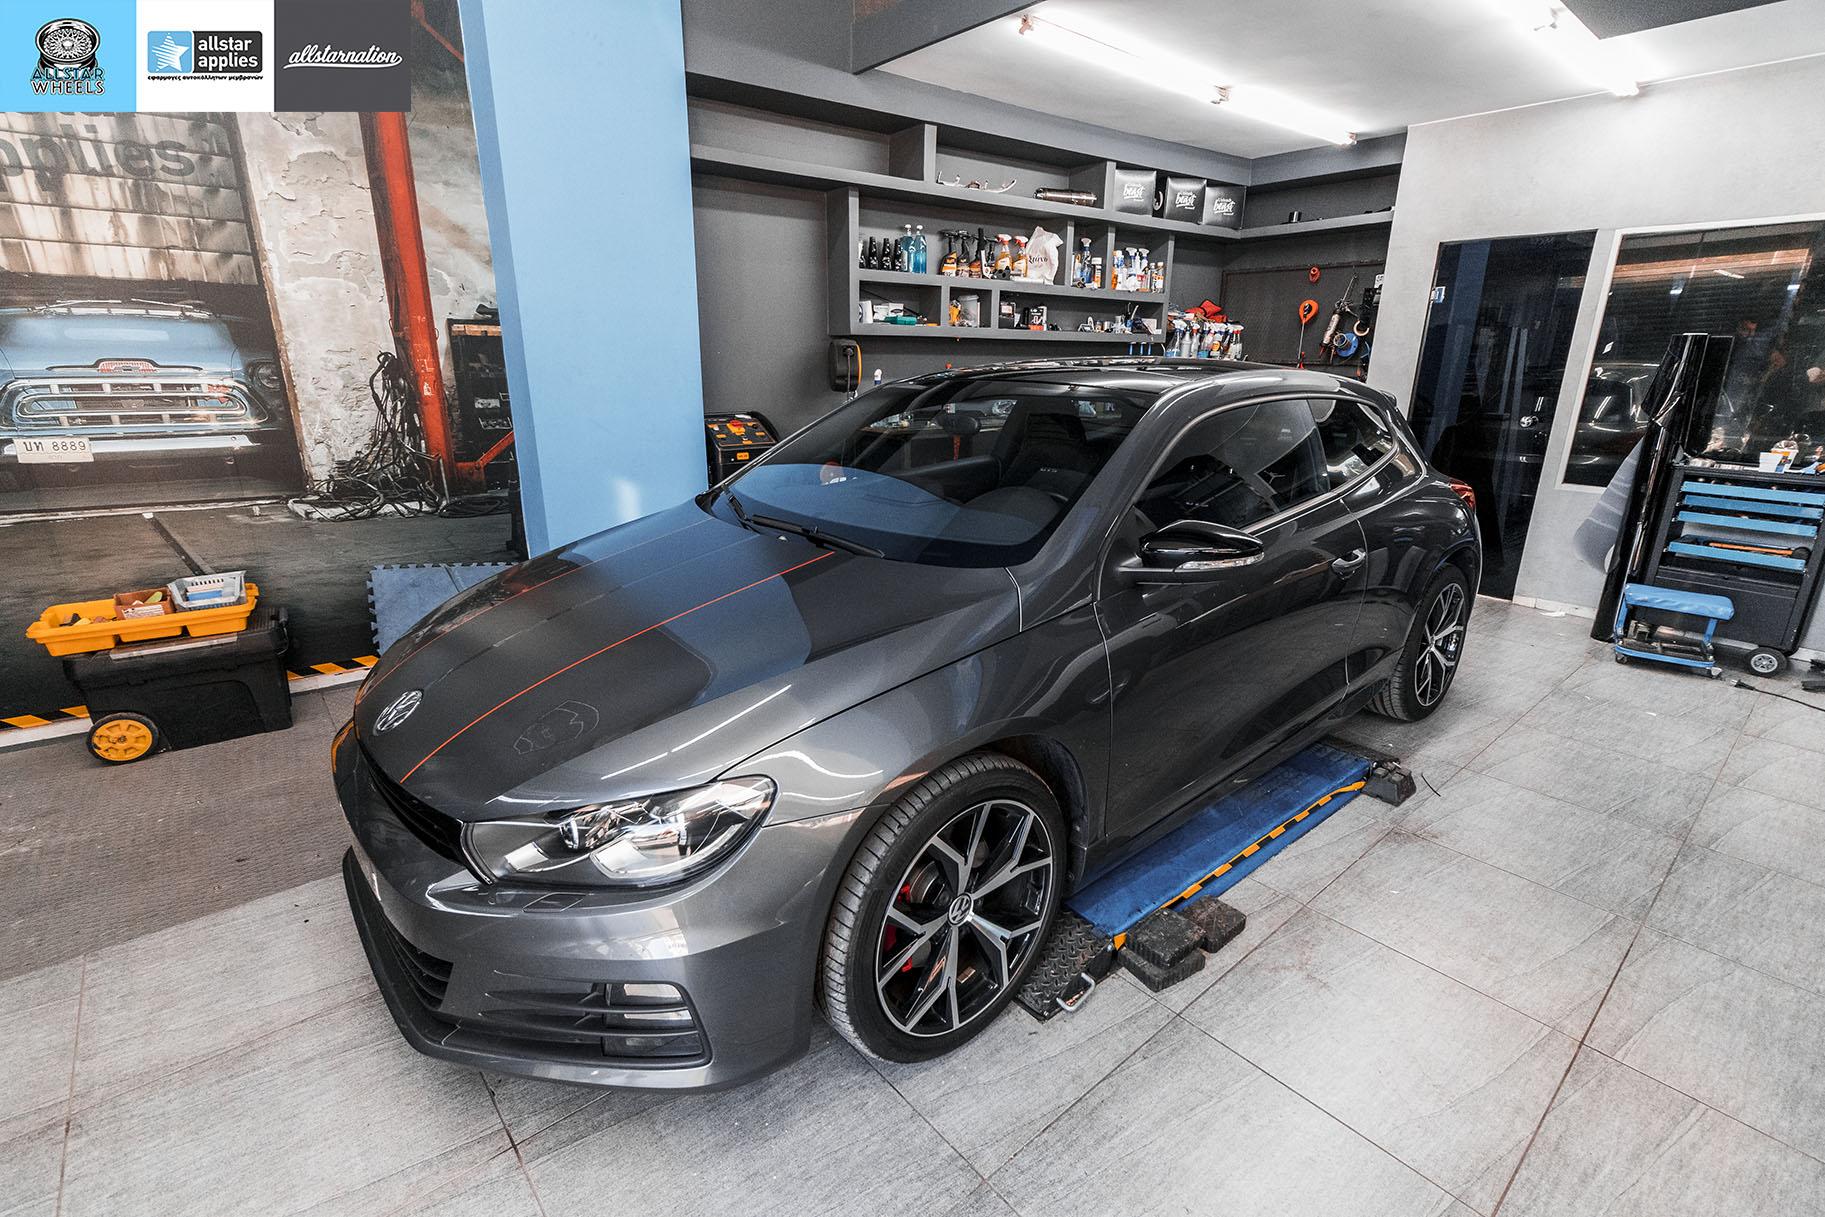 VW SCIROCCO MATT DIAMOND BLACK ALLSTAR APPLIES (1)